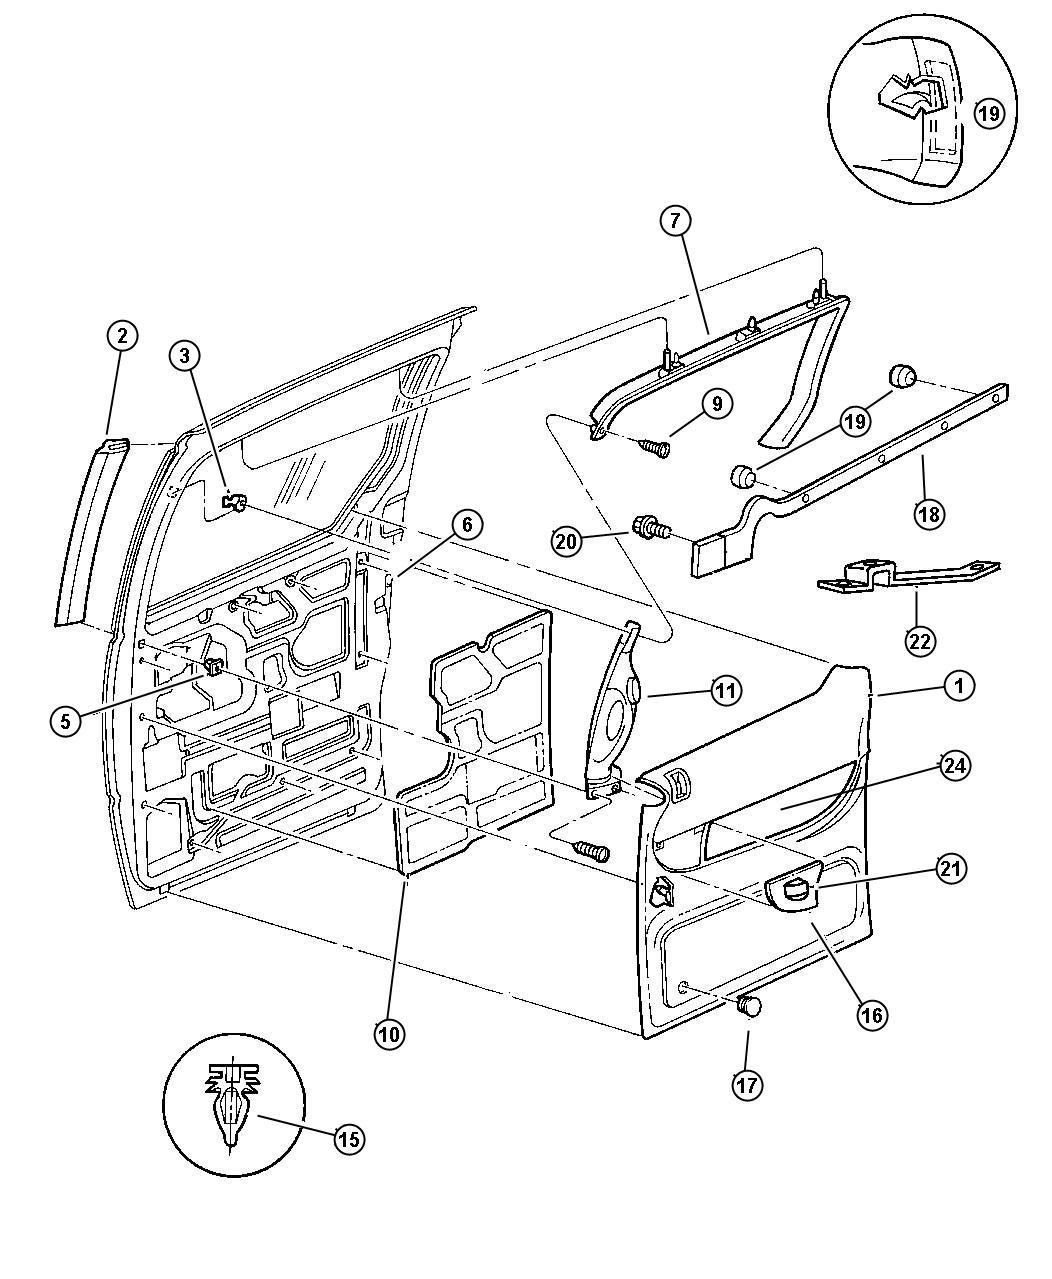 diagram jeep grand cherokee rear exterior